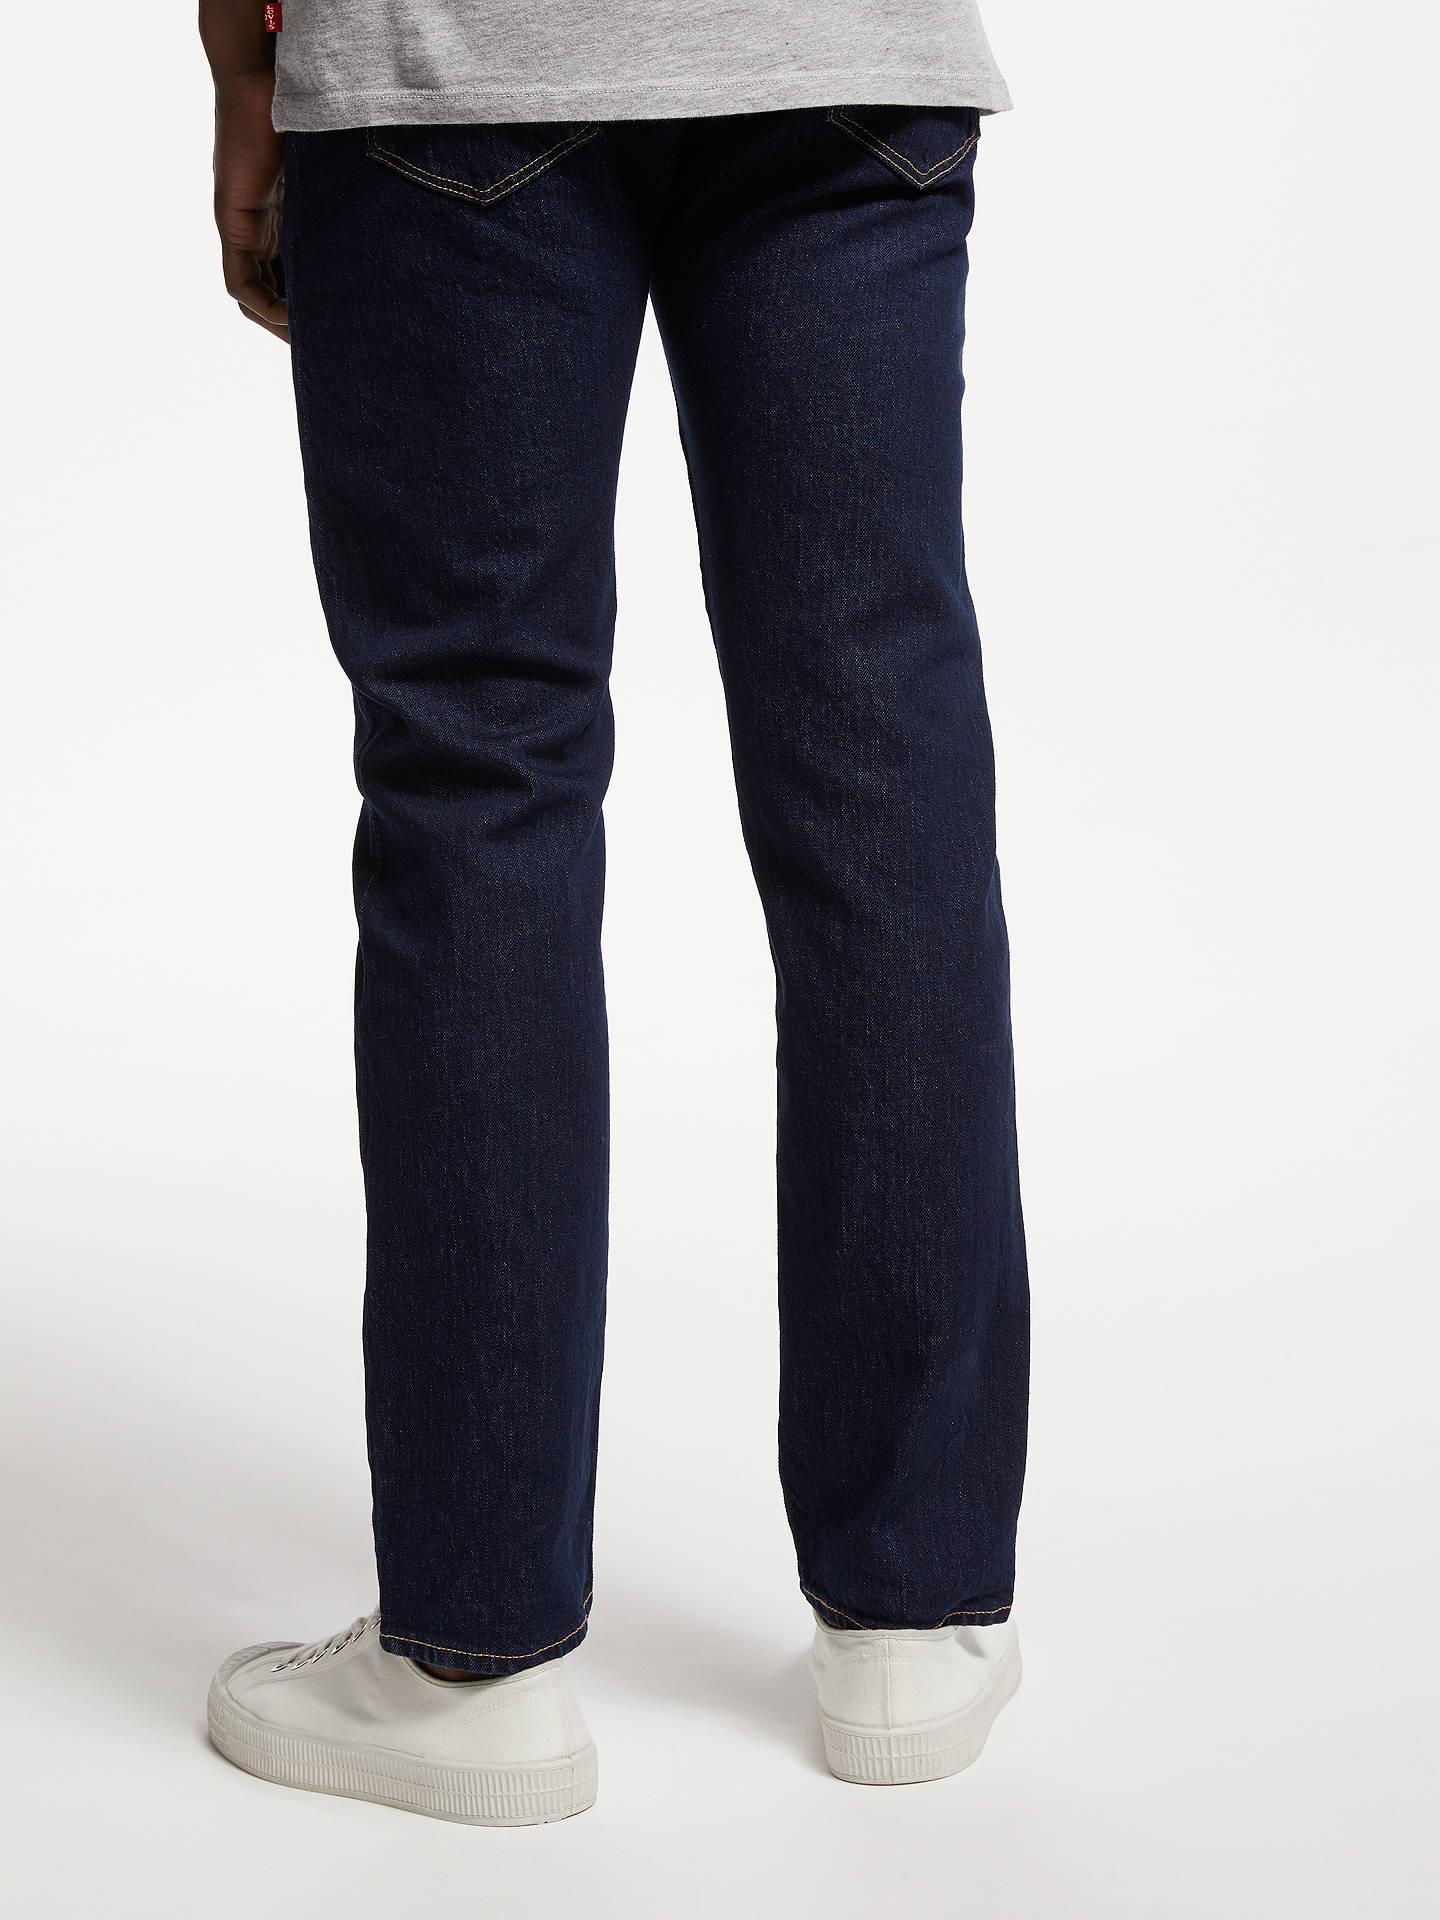 5dcde380b2b ... Buy Levi's 502 Regular Jeans, Chain Rinse, 30S Online at johnlewis. ...